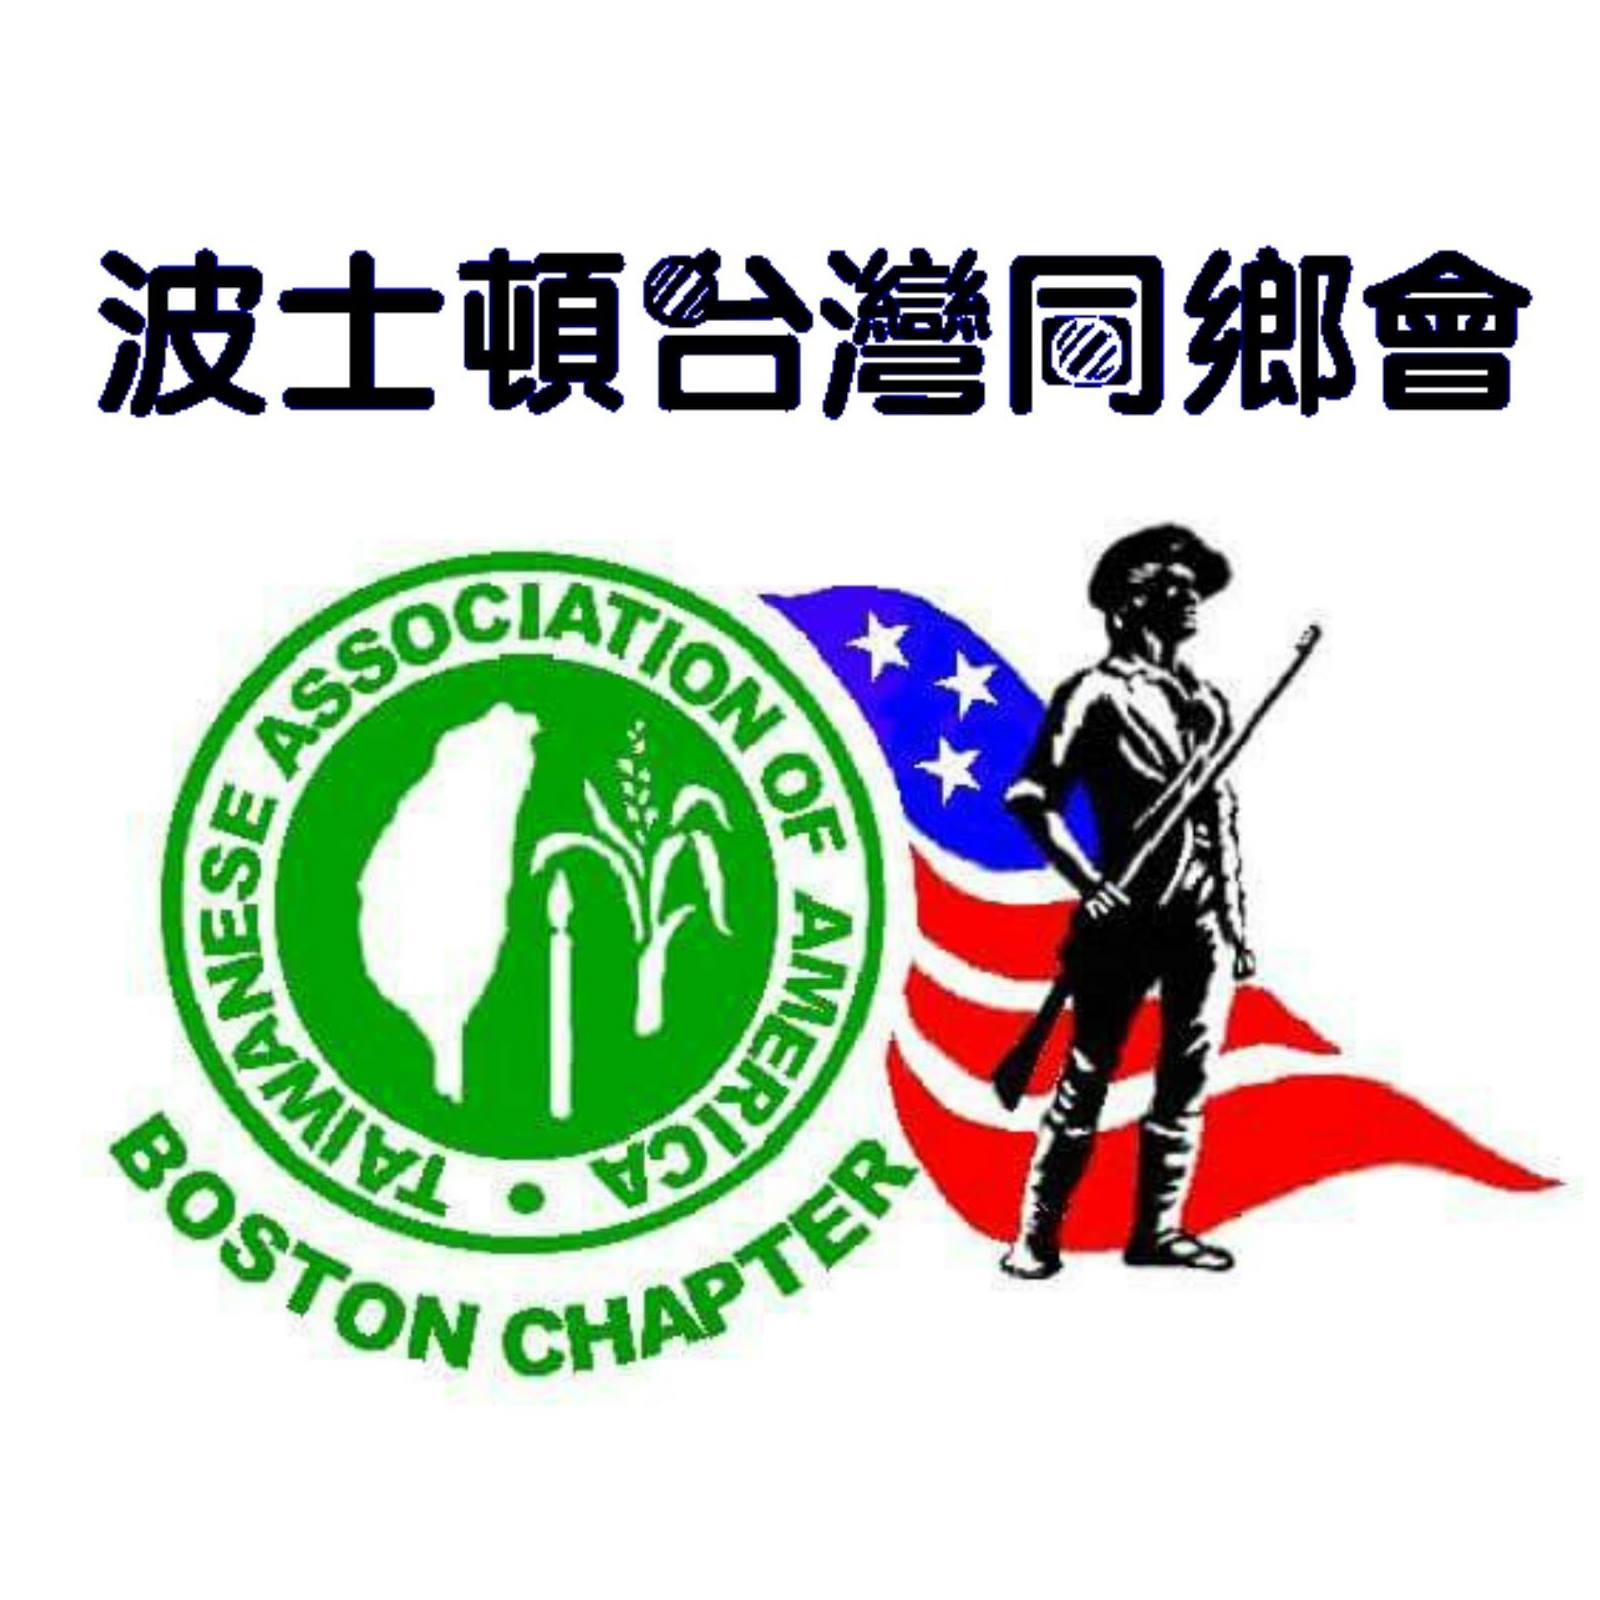 TAA/Boston Chapter (波士頓台灣同鄉會)